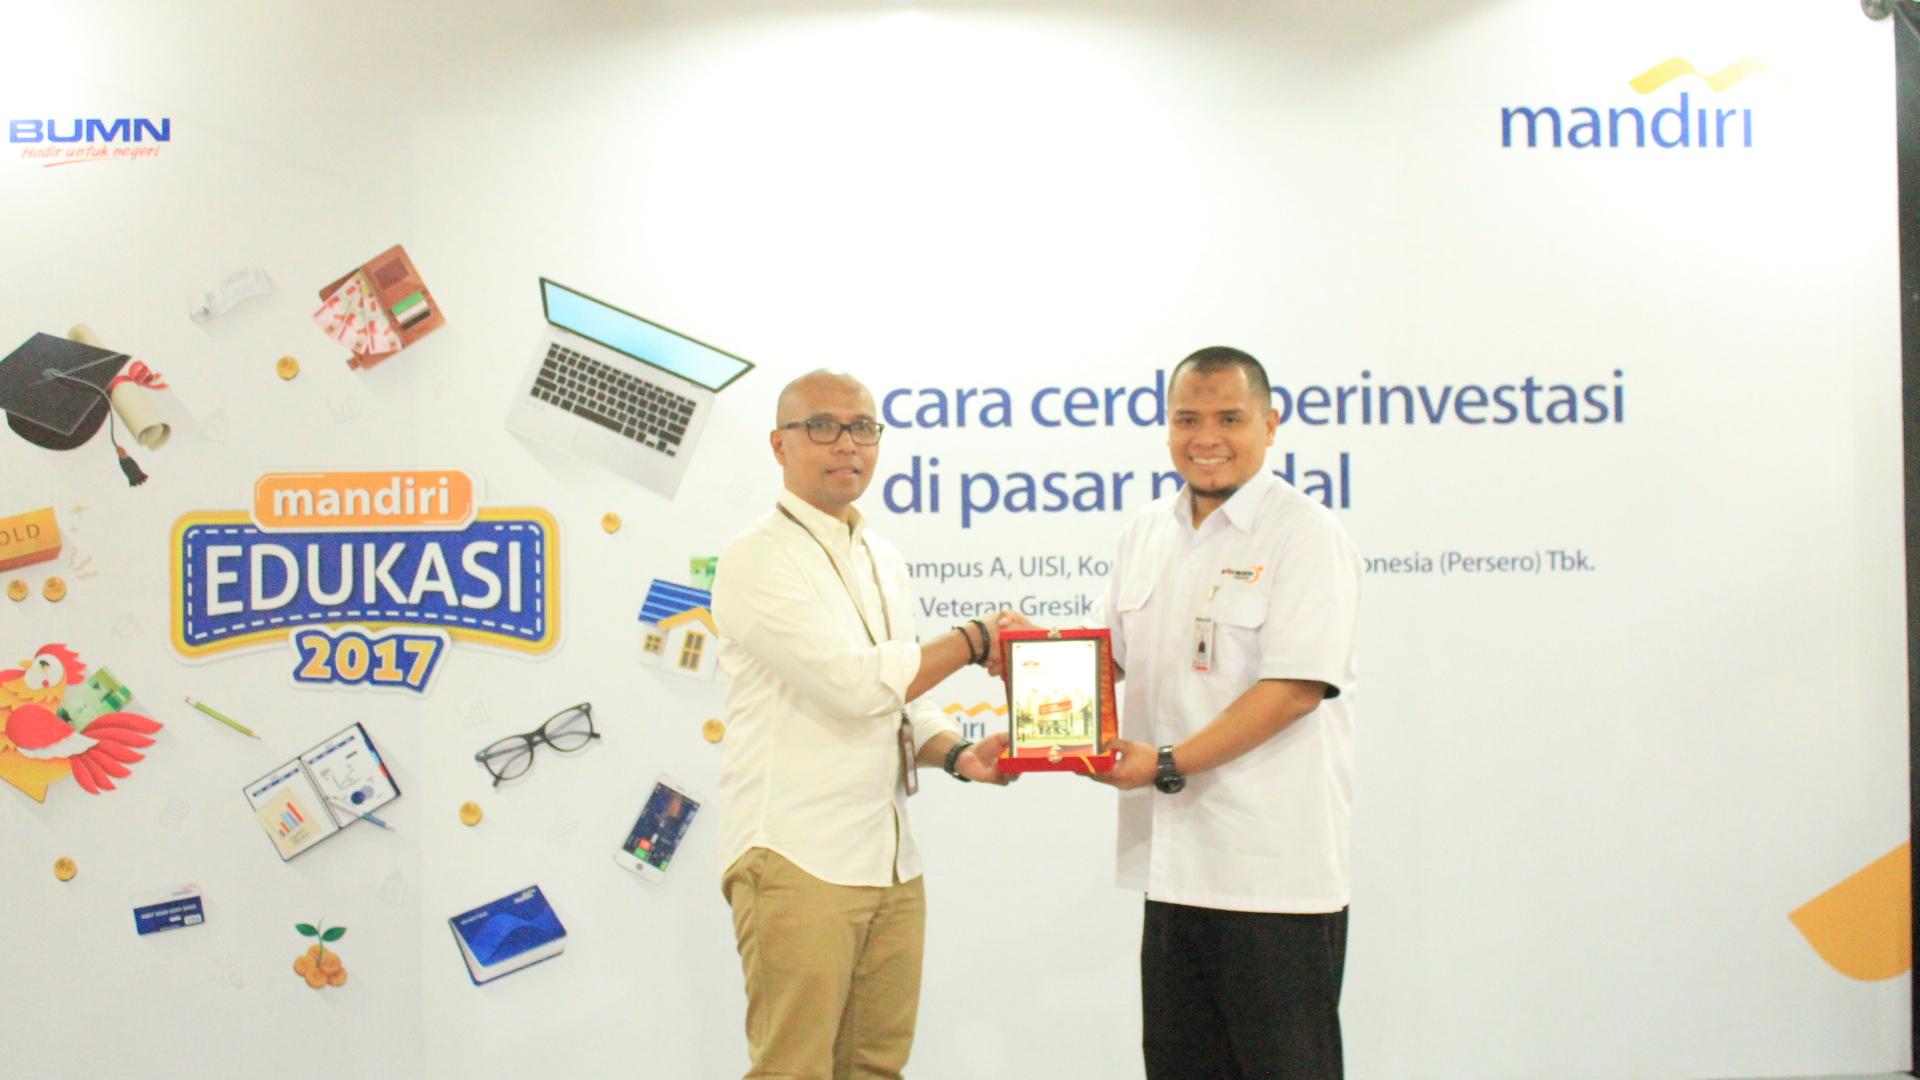 Penyerahan Cinderamata antara UISI dan Bank Mandiri yang diwakili oleh Bambang Tutuko, S.E. M.M selaku Ketua LPPM UISI